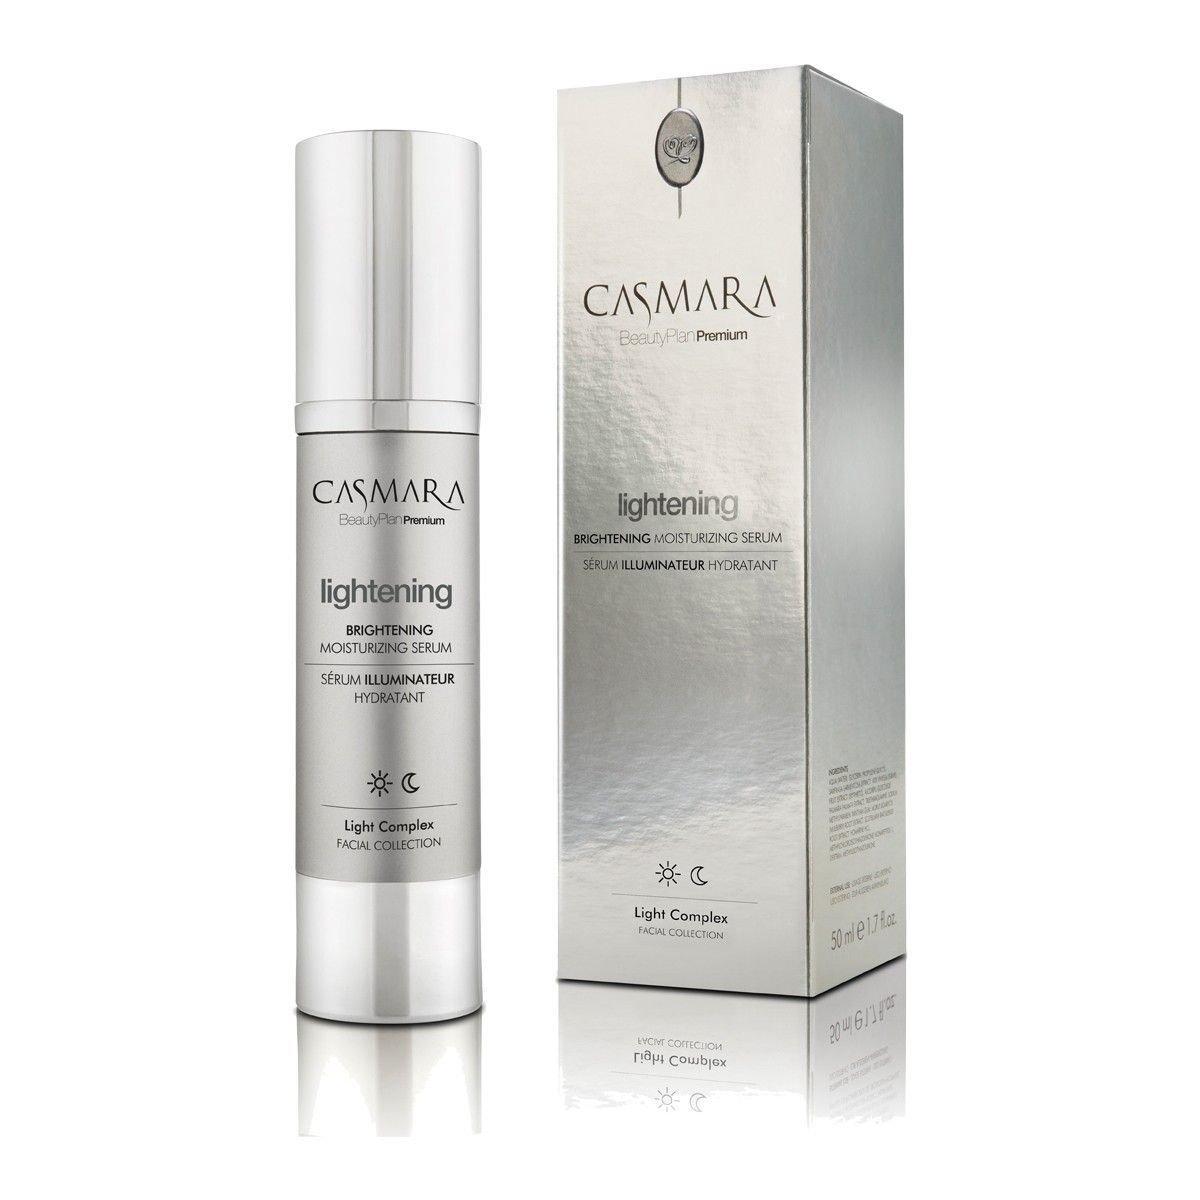 Afbeelding van Casmara Brightening Moisturizing Serum 50Ml Lightening / Clarifying Beauty